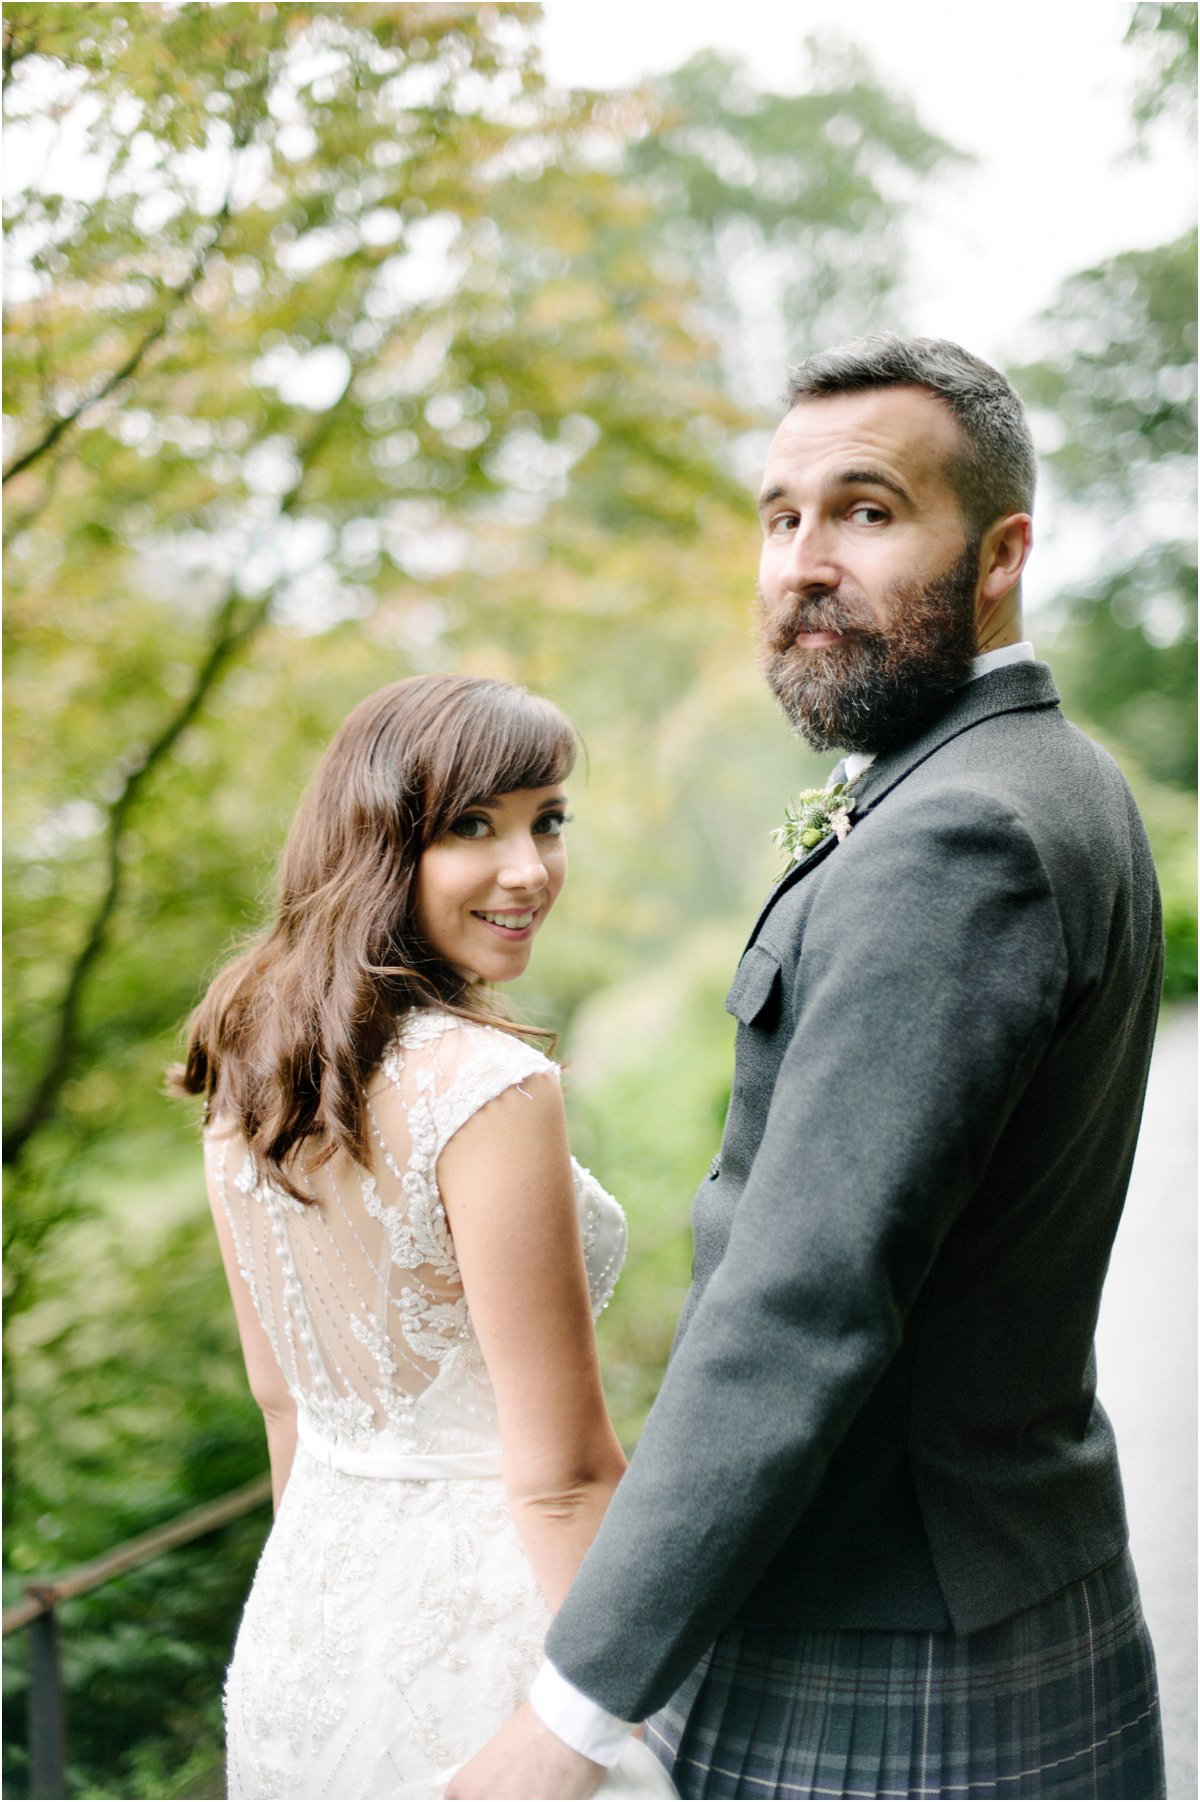 Crofts & Kowalczyk Best Wedding Photography Scotland Blogpost-2.jpg